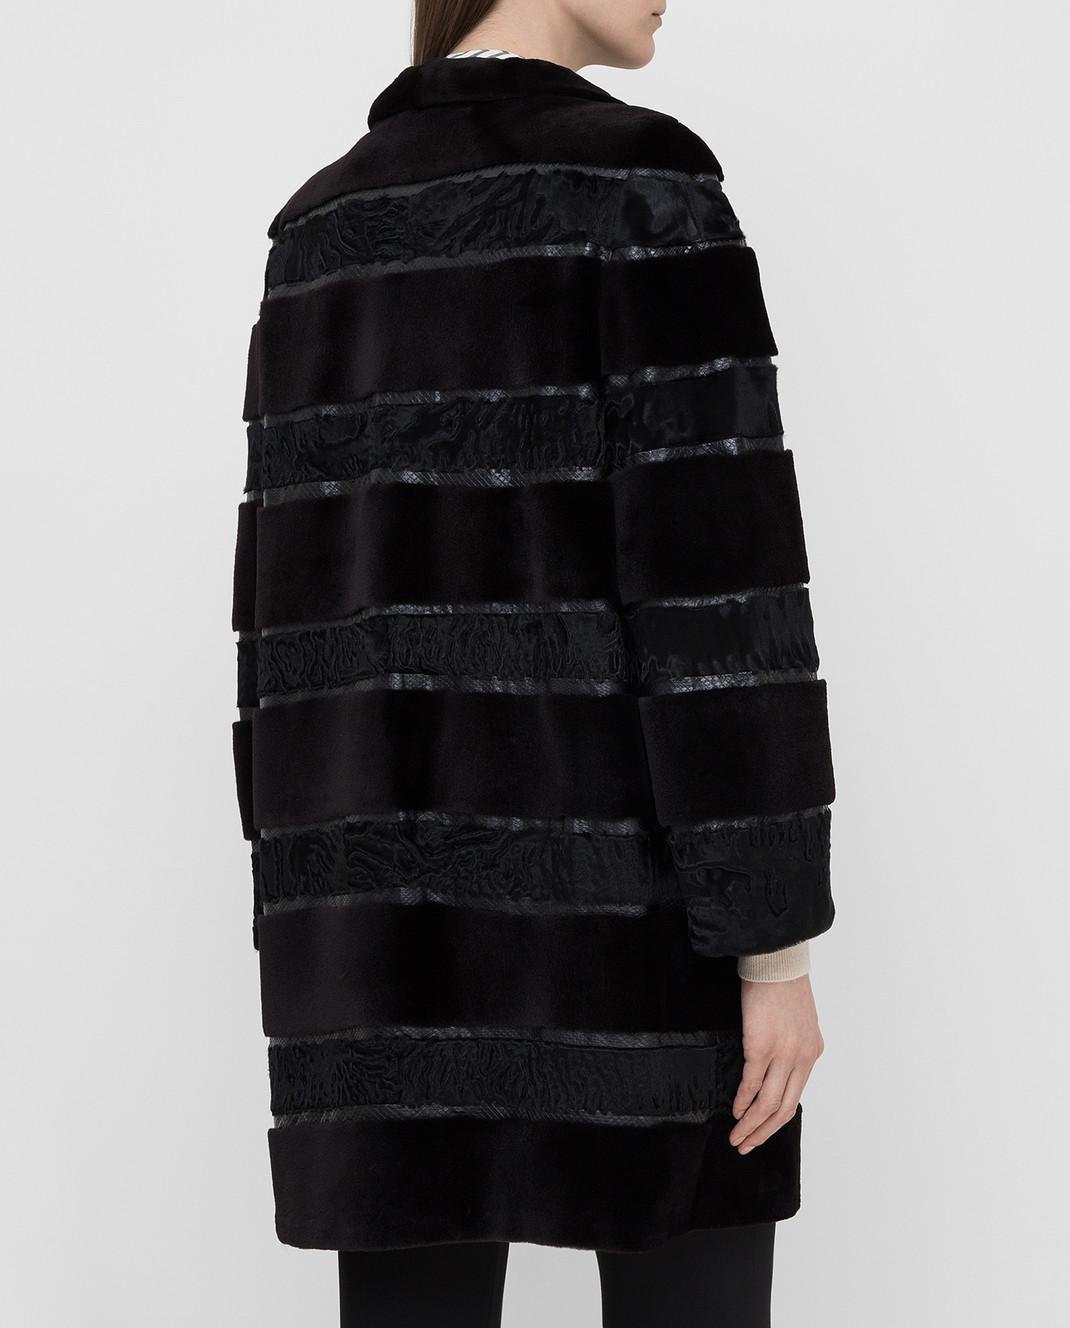 Florence Mode Черная шуба из меха норки и меха ягненка L1434 изображение 4